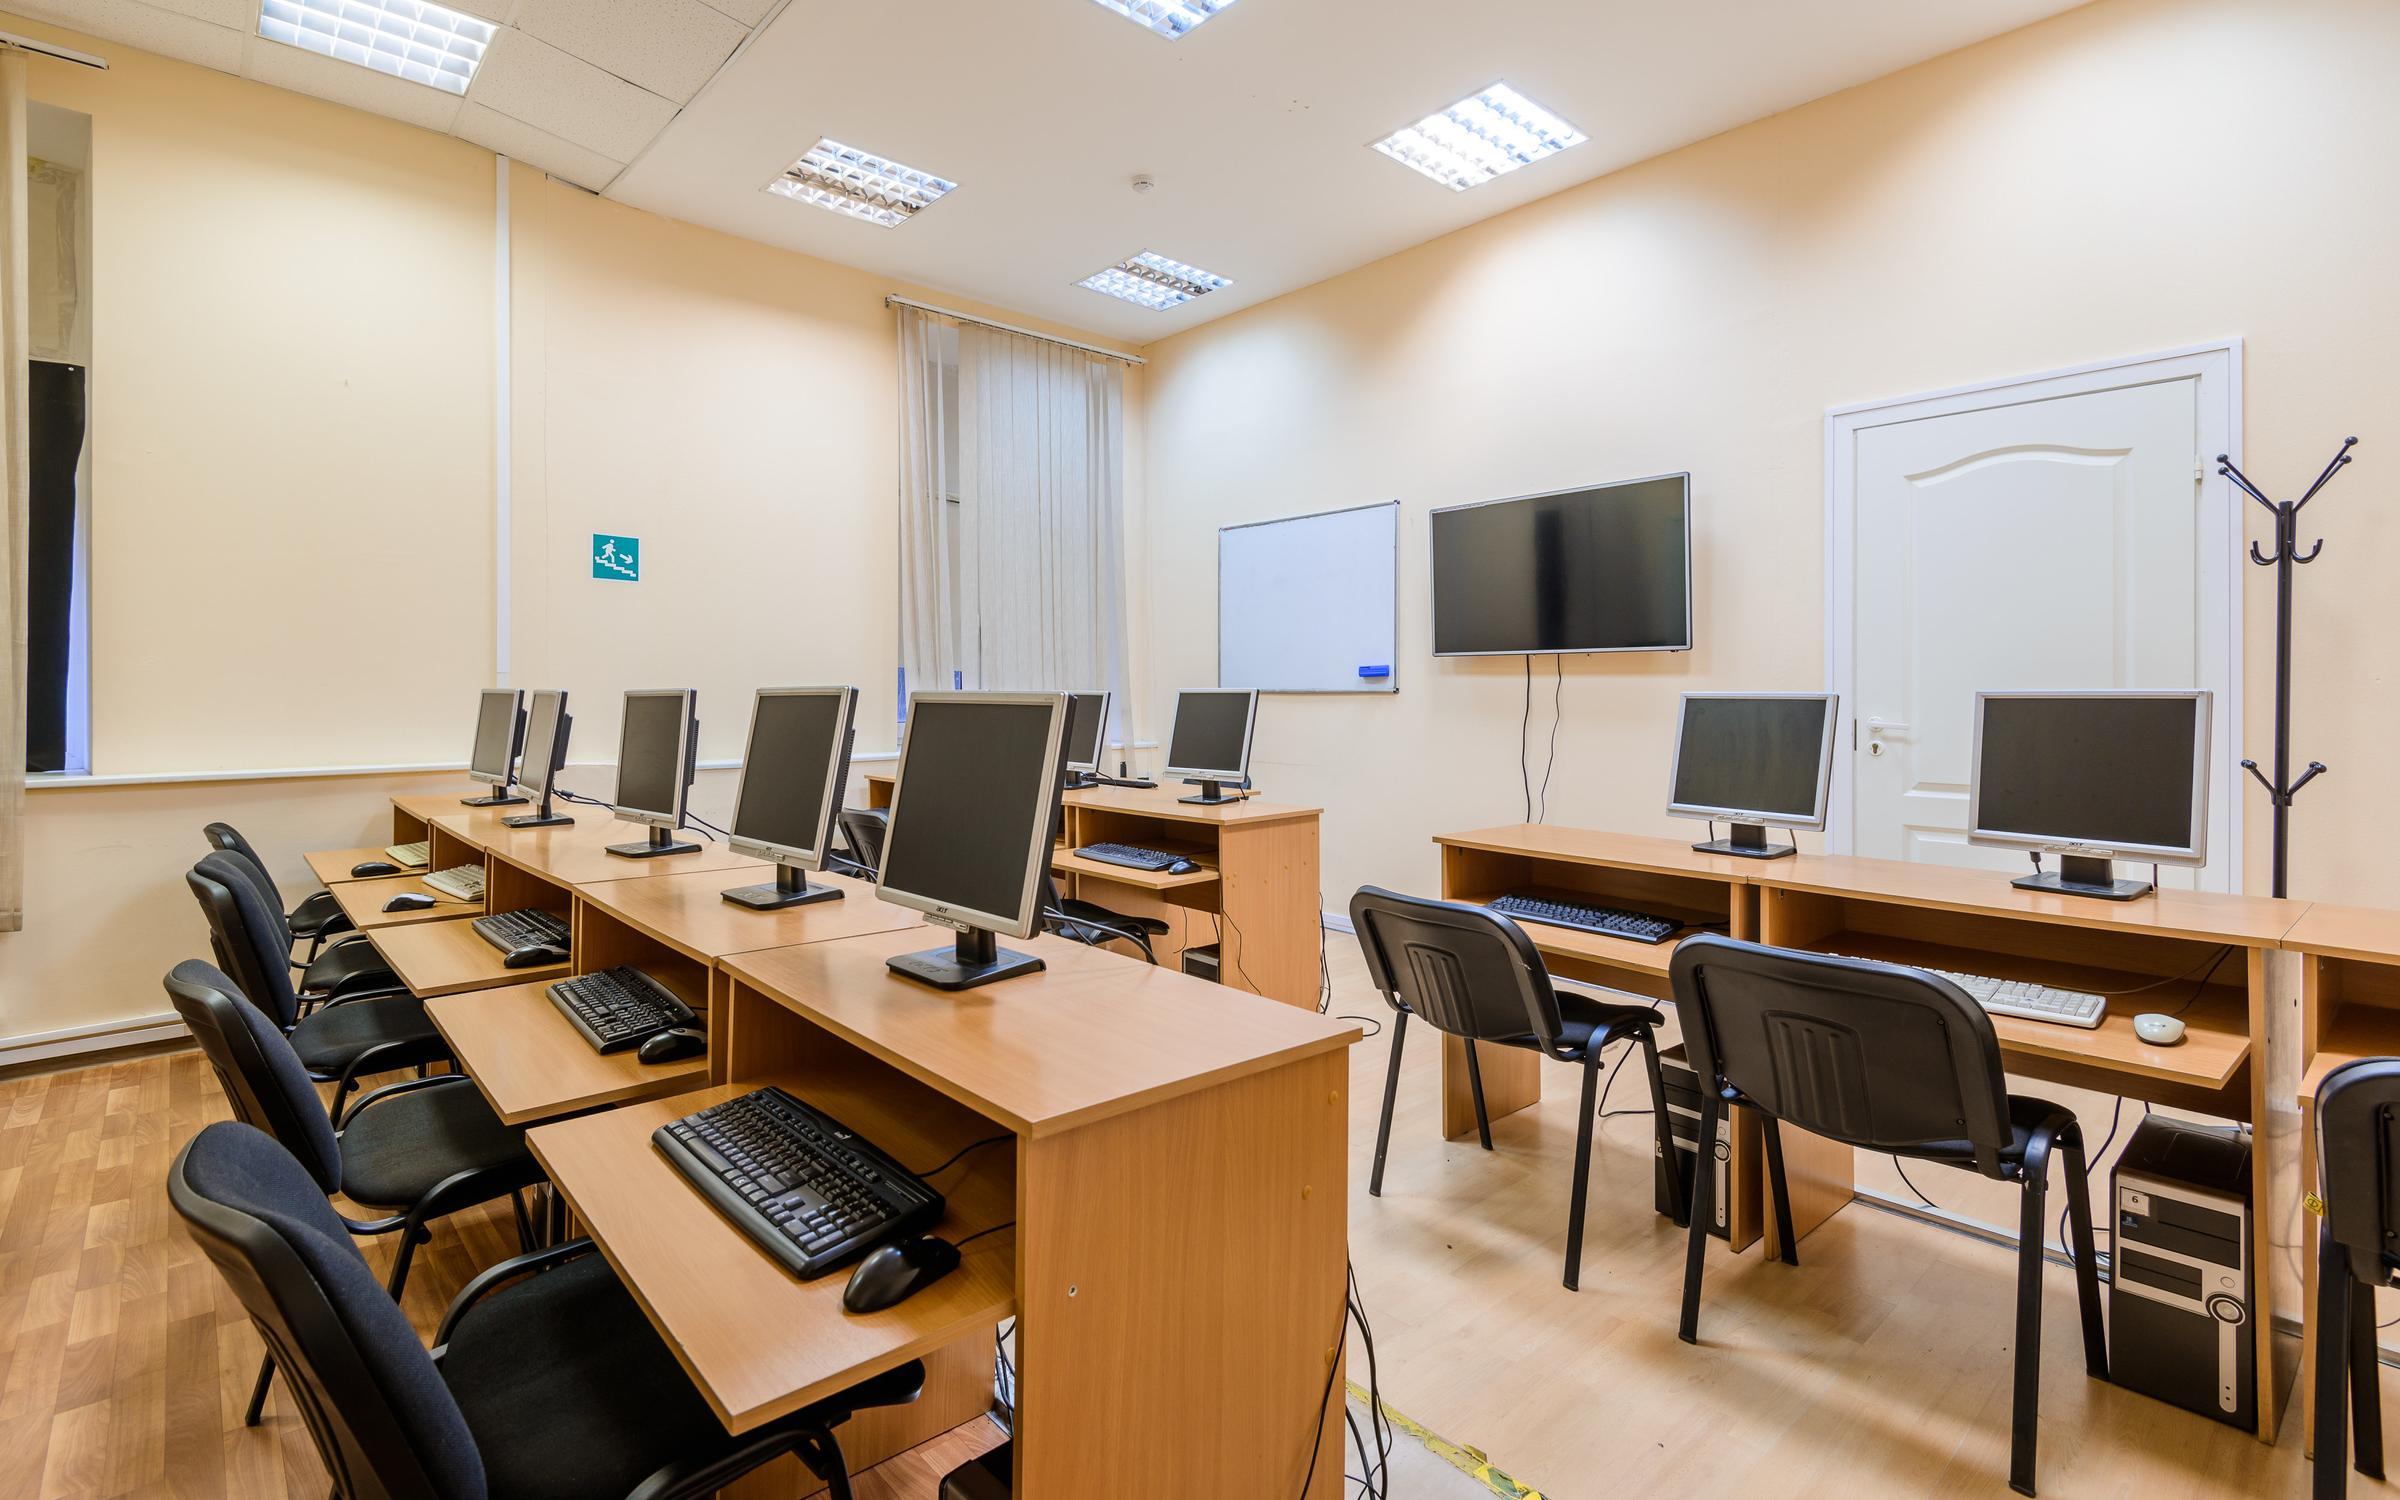 фотография Учебного центра Базис на метро Озерки